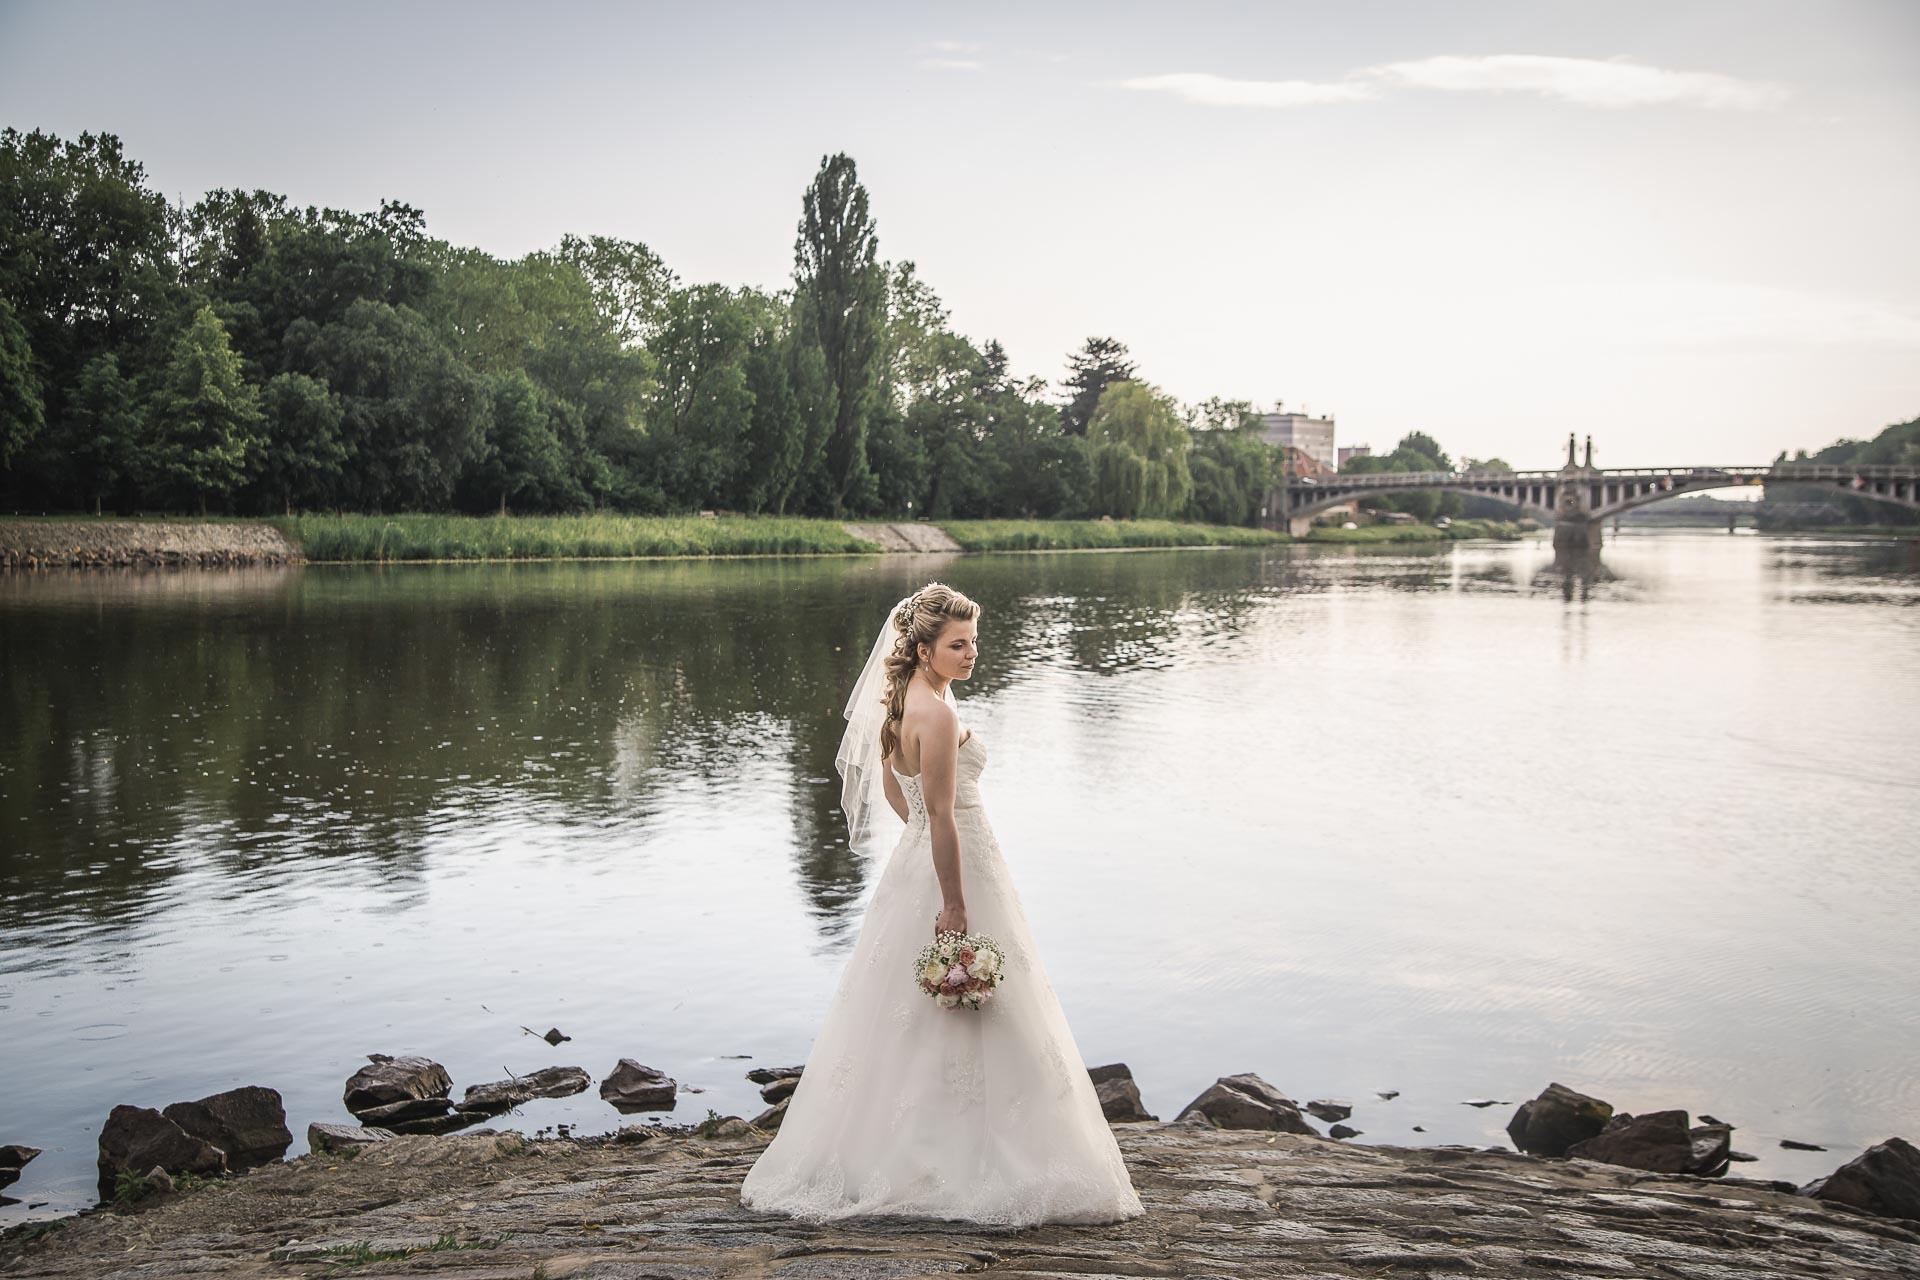 Svatební-fotograf-Nymburk-6253